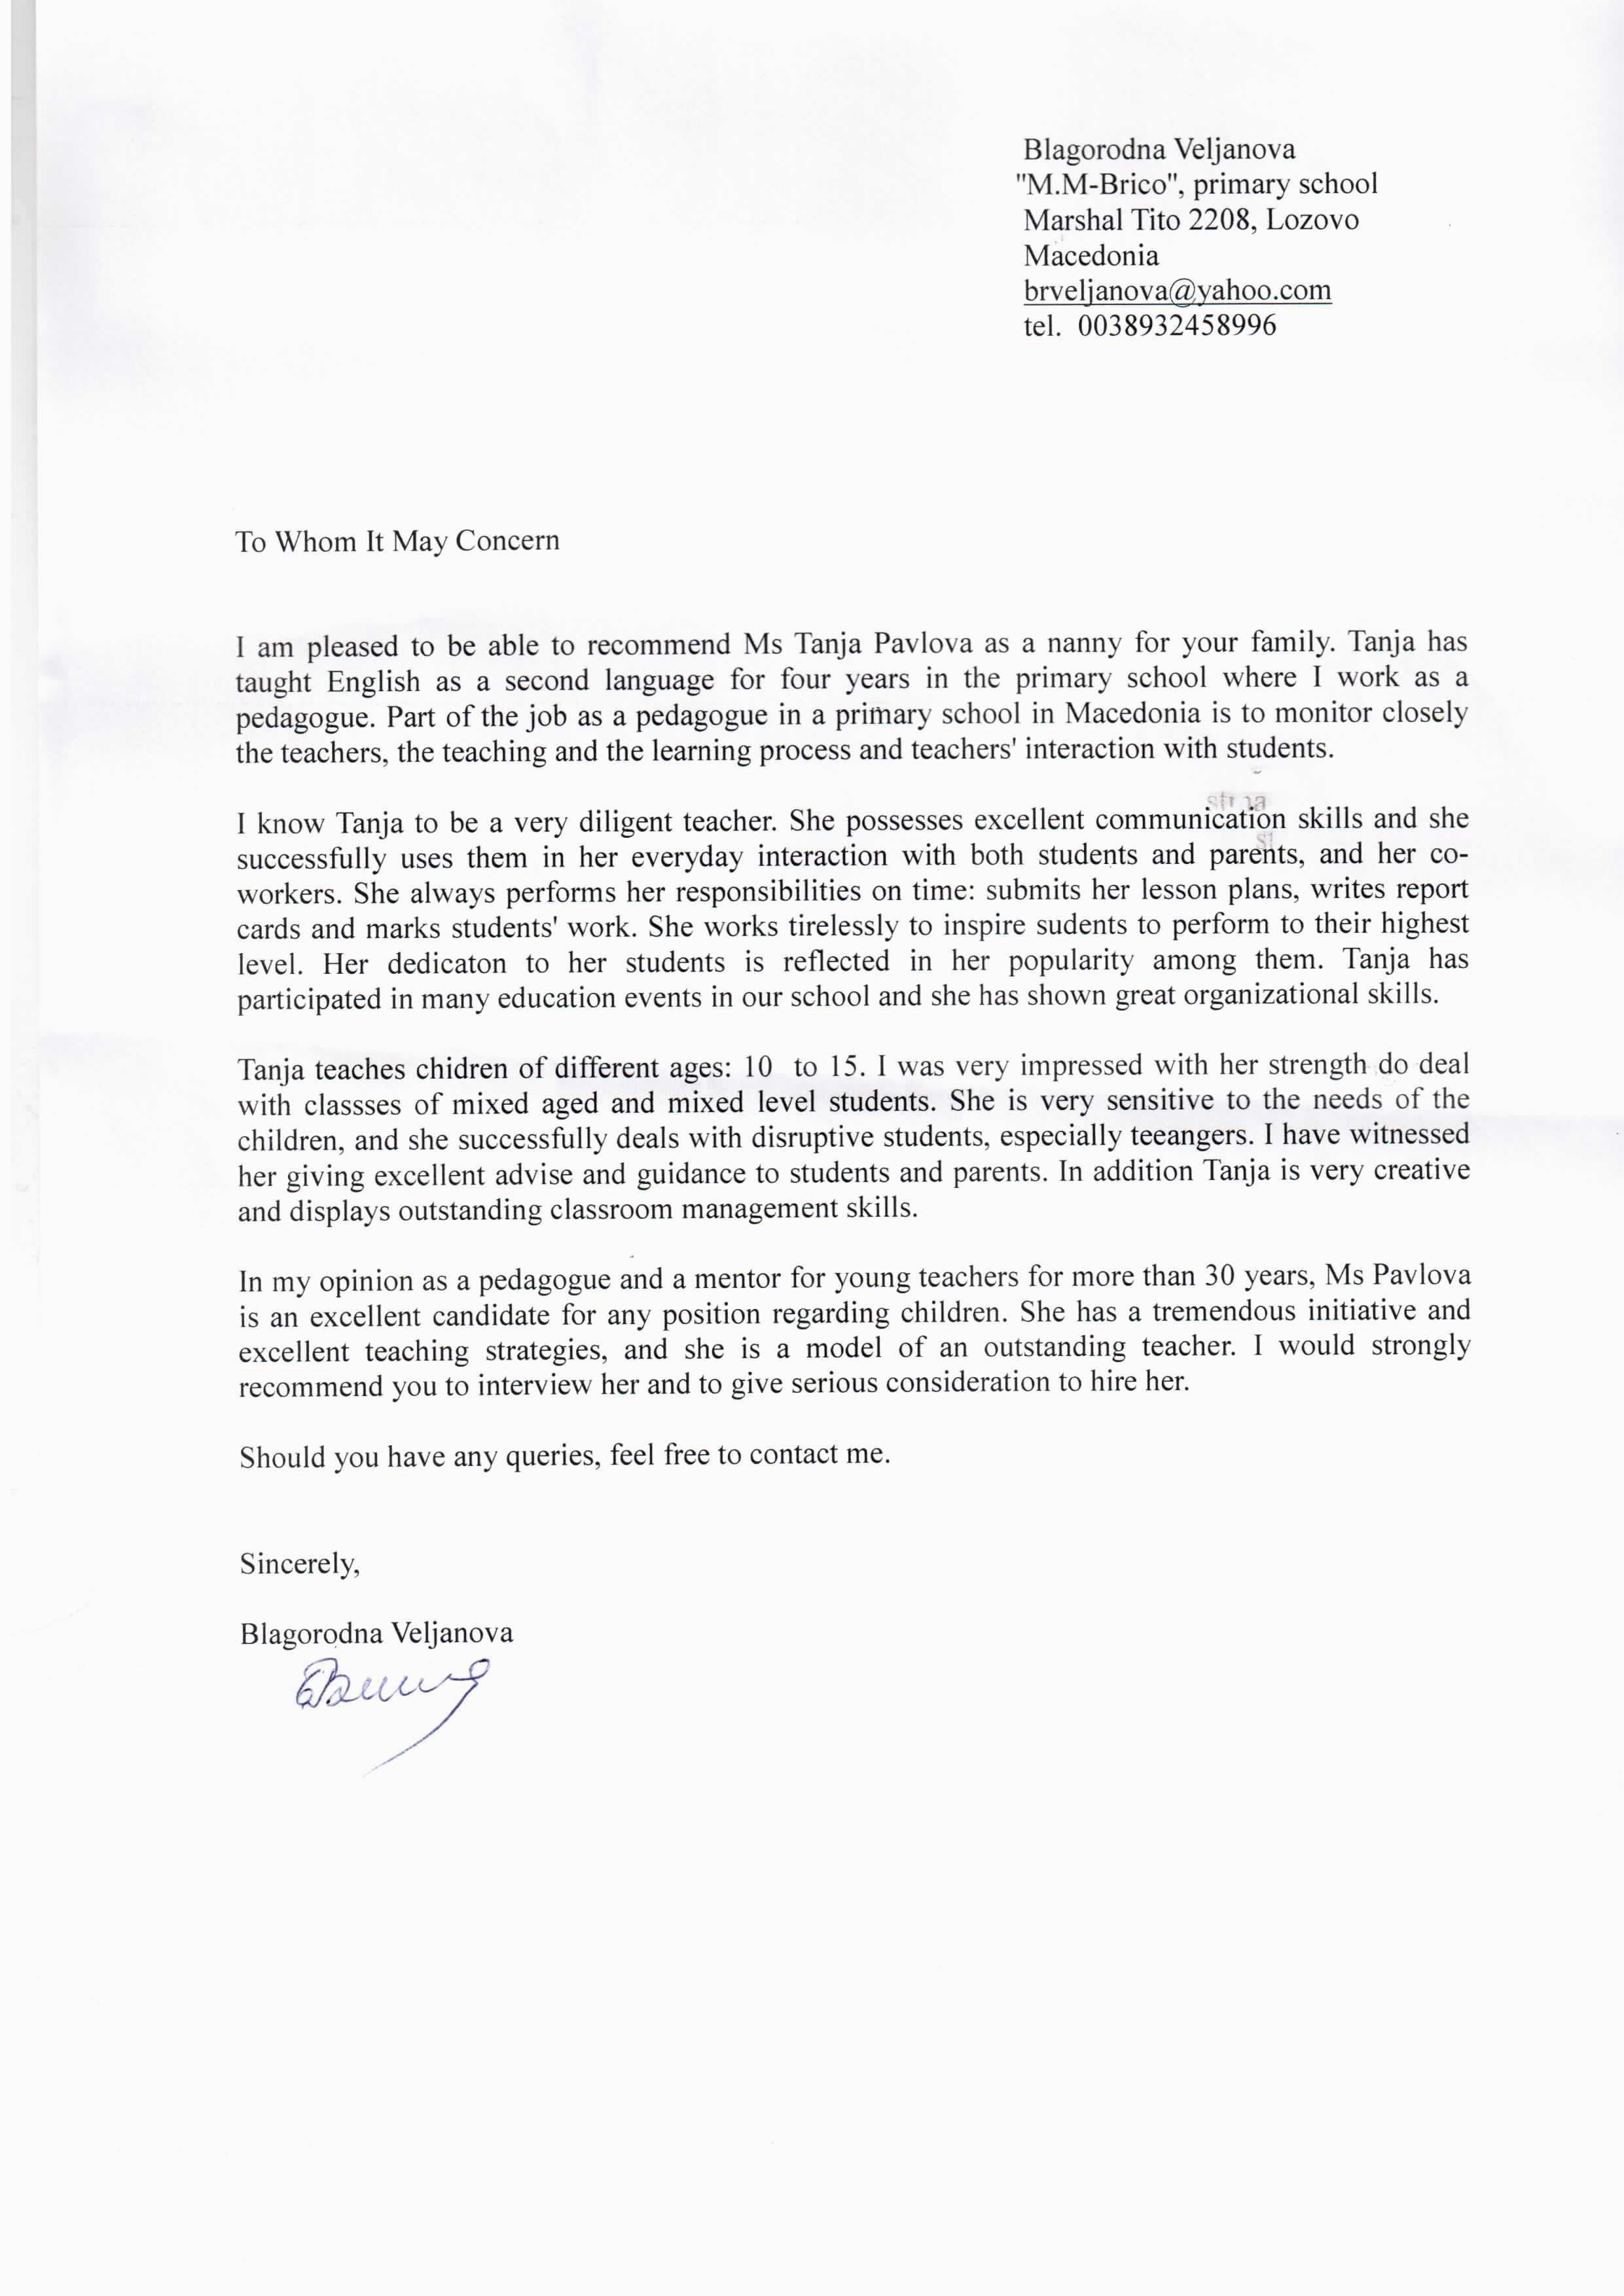 Babysitter Letter Of Recommendation Awesome Reference Letter Nanny Efimorena